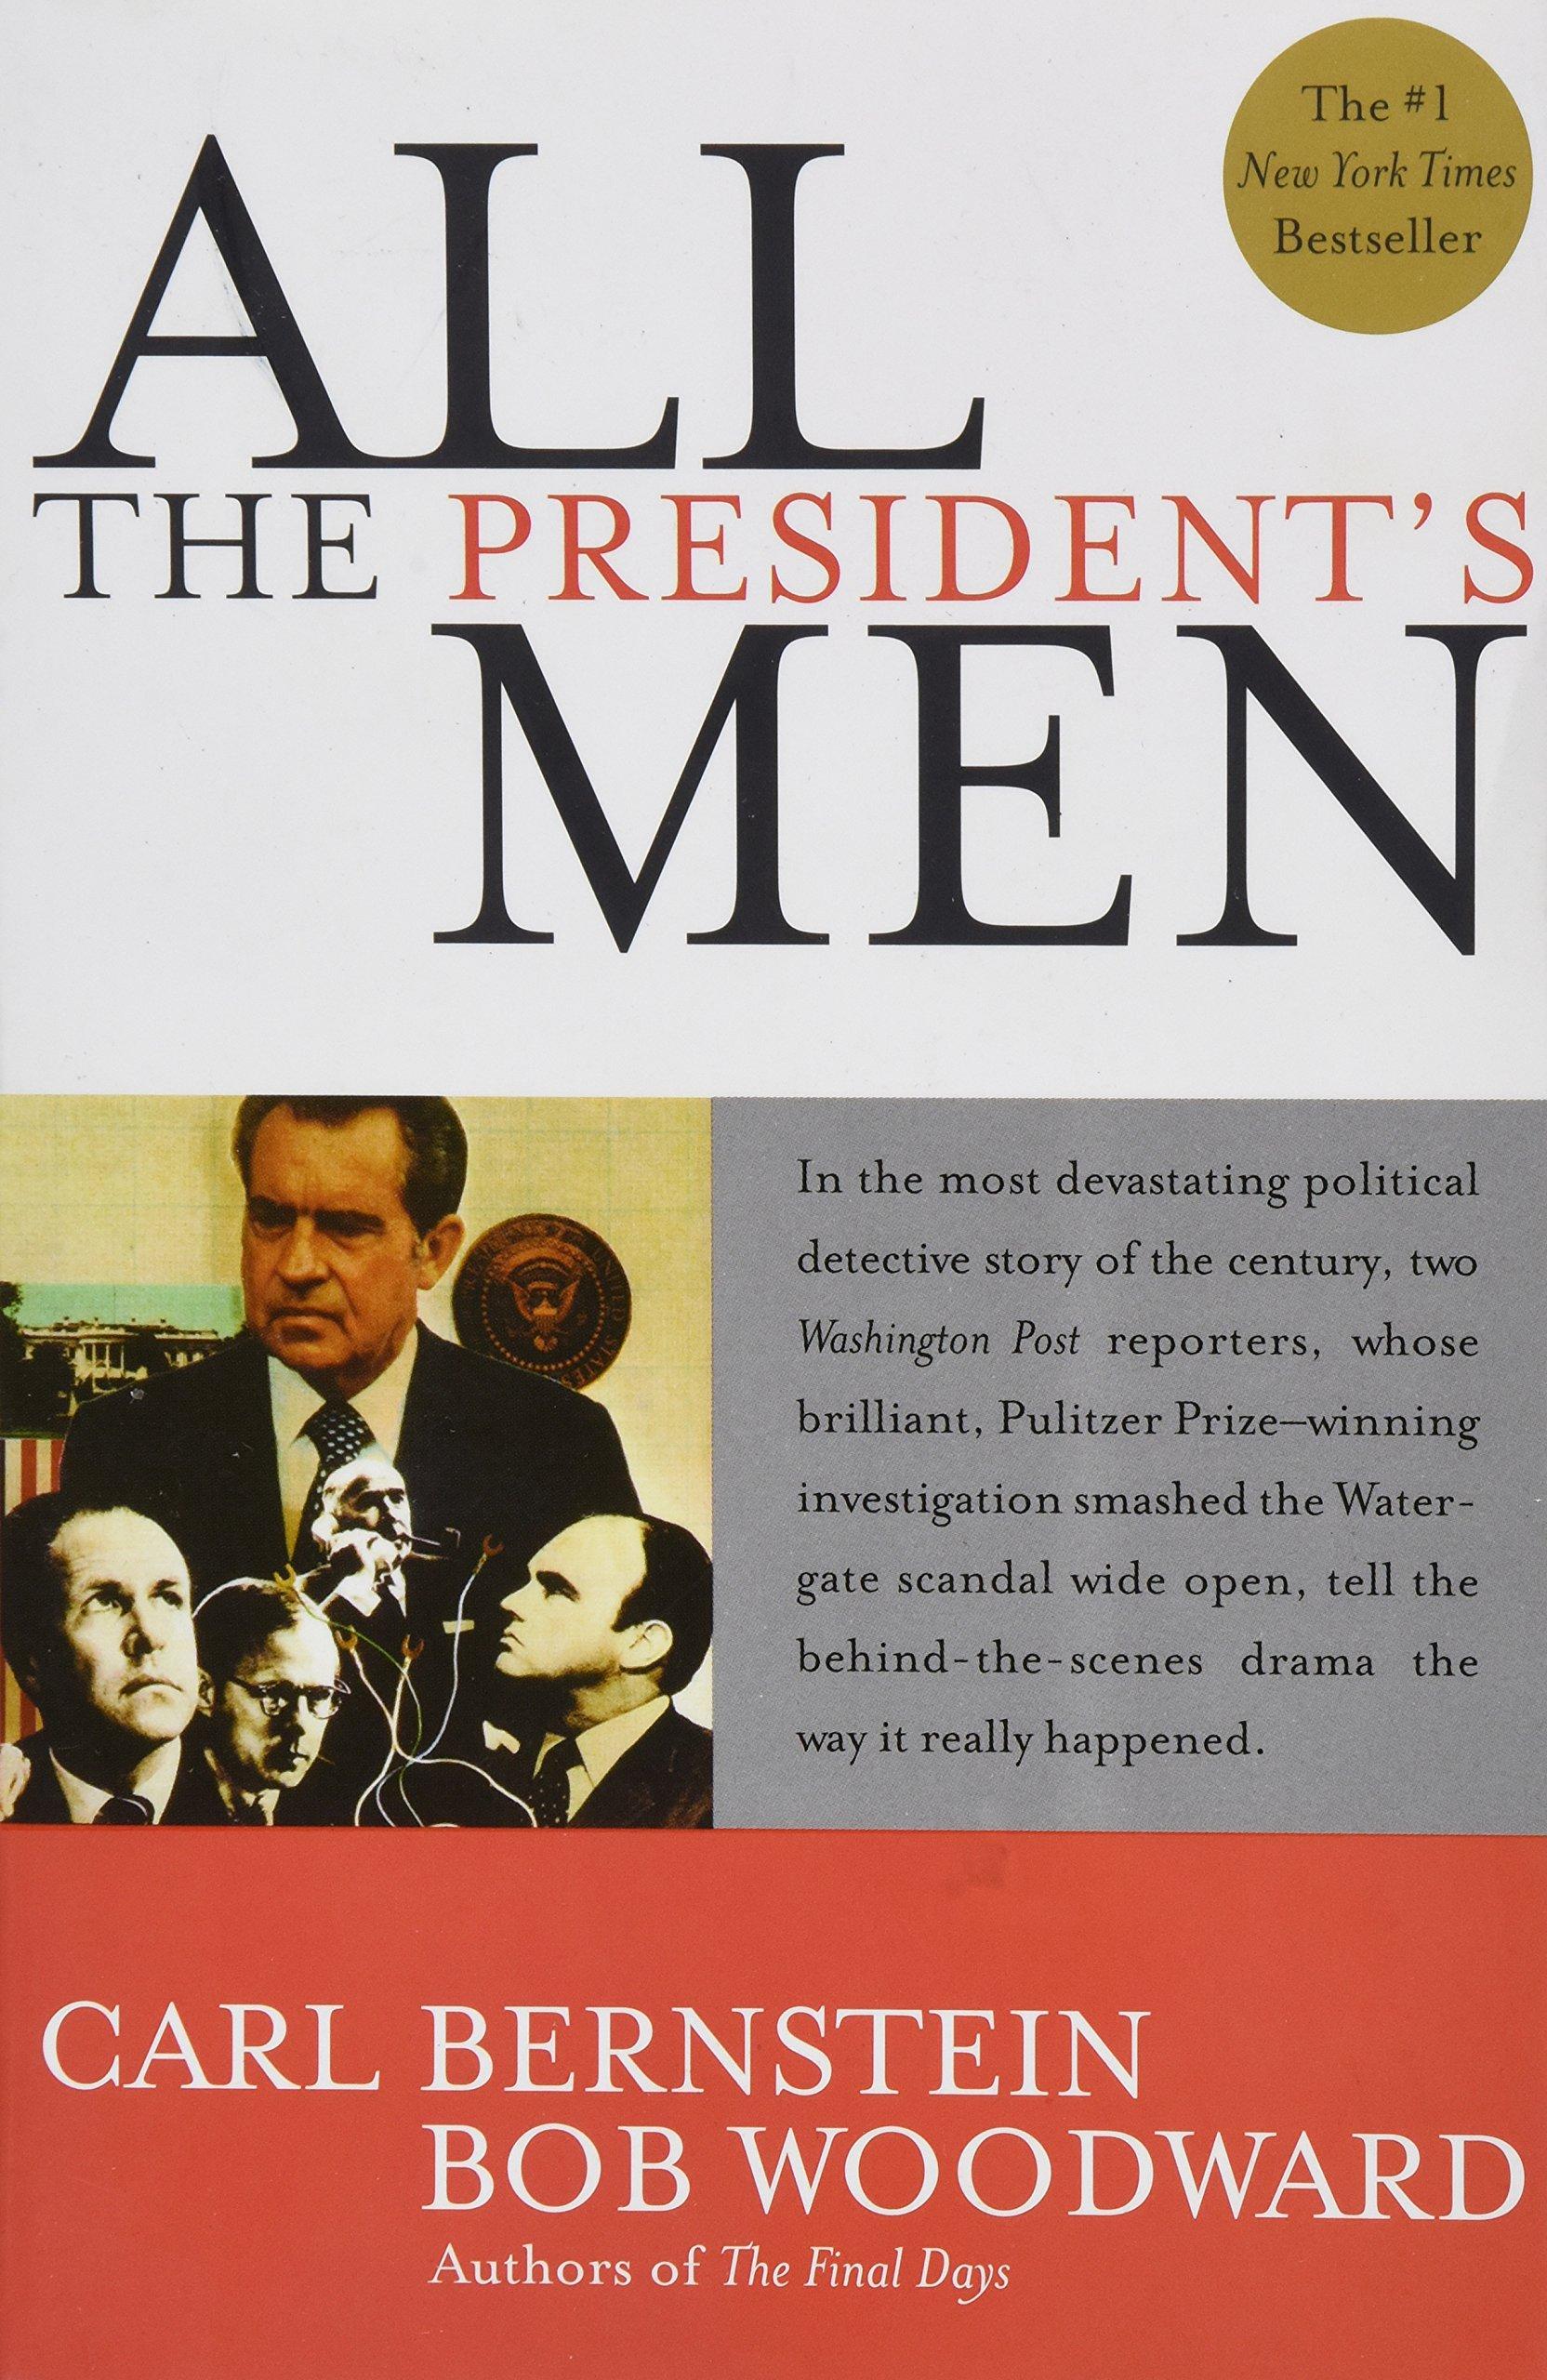 All The President's Men: Bob Woodward Carl Bernstein: Amazon.com: Books